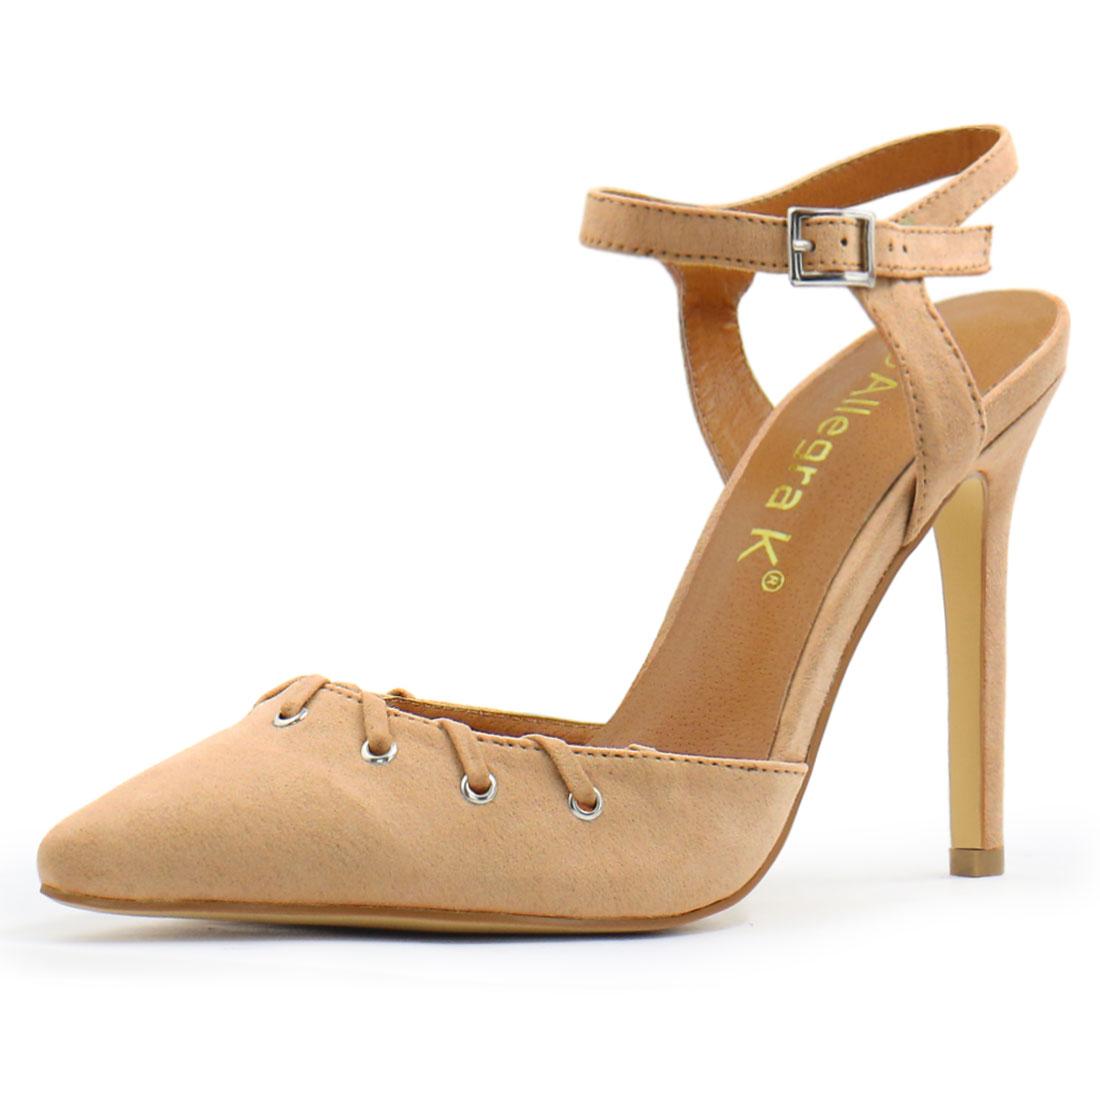 Women Pointed Toe Stiletto Lace Up Decor Ankle Strap Pumps Beige US 7.5